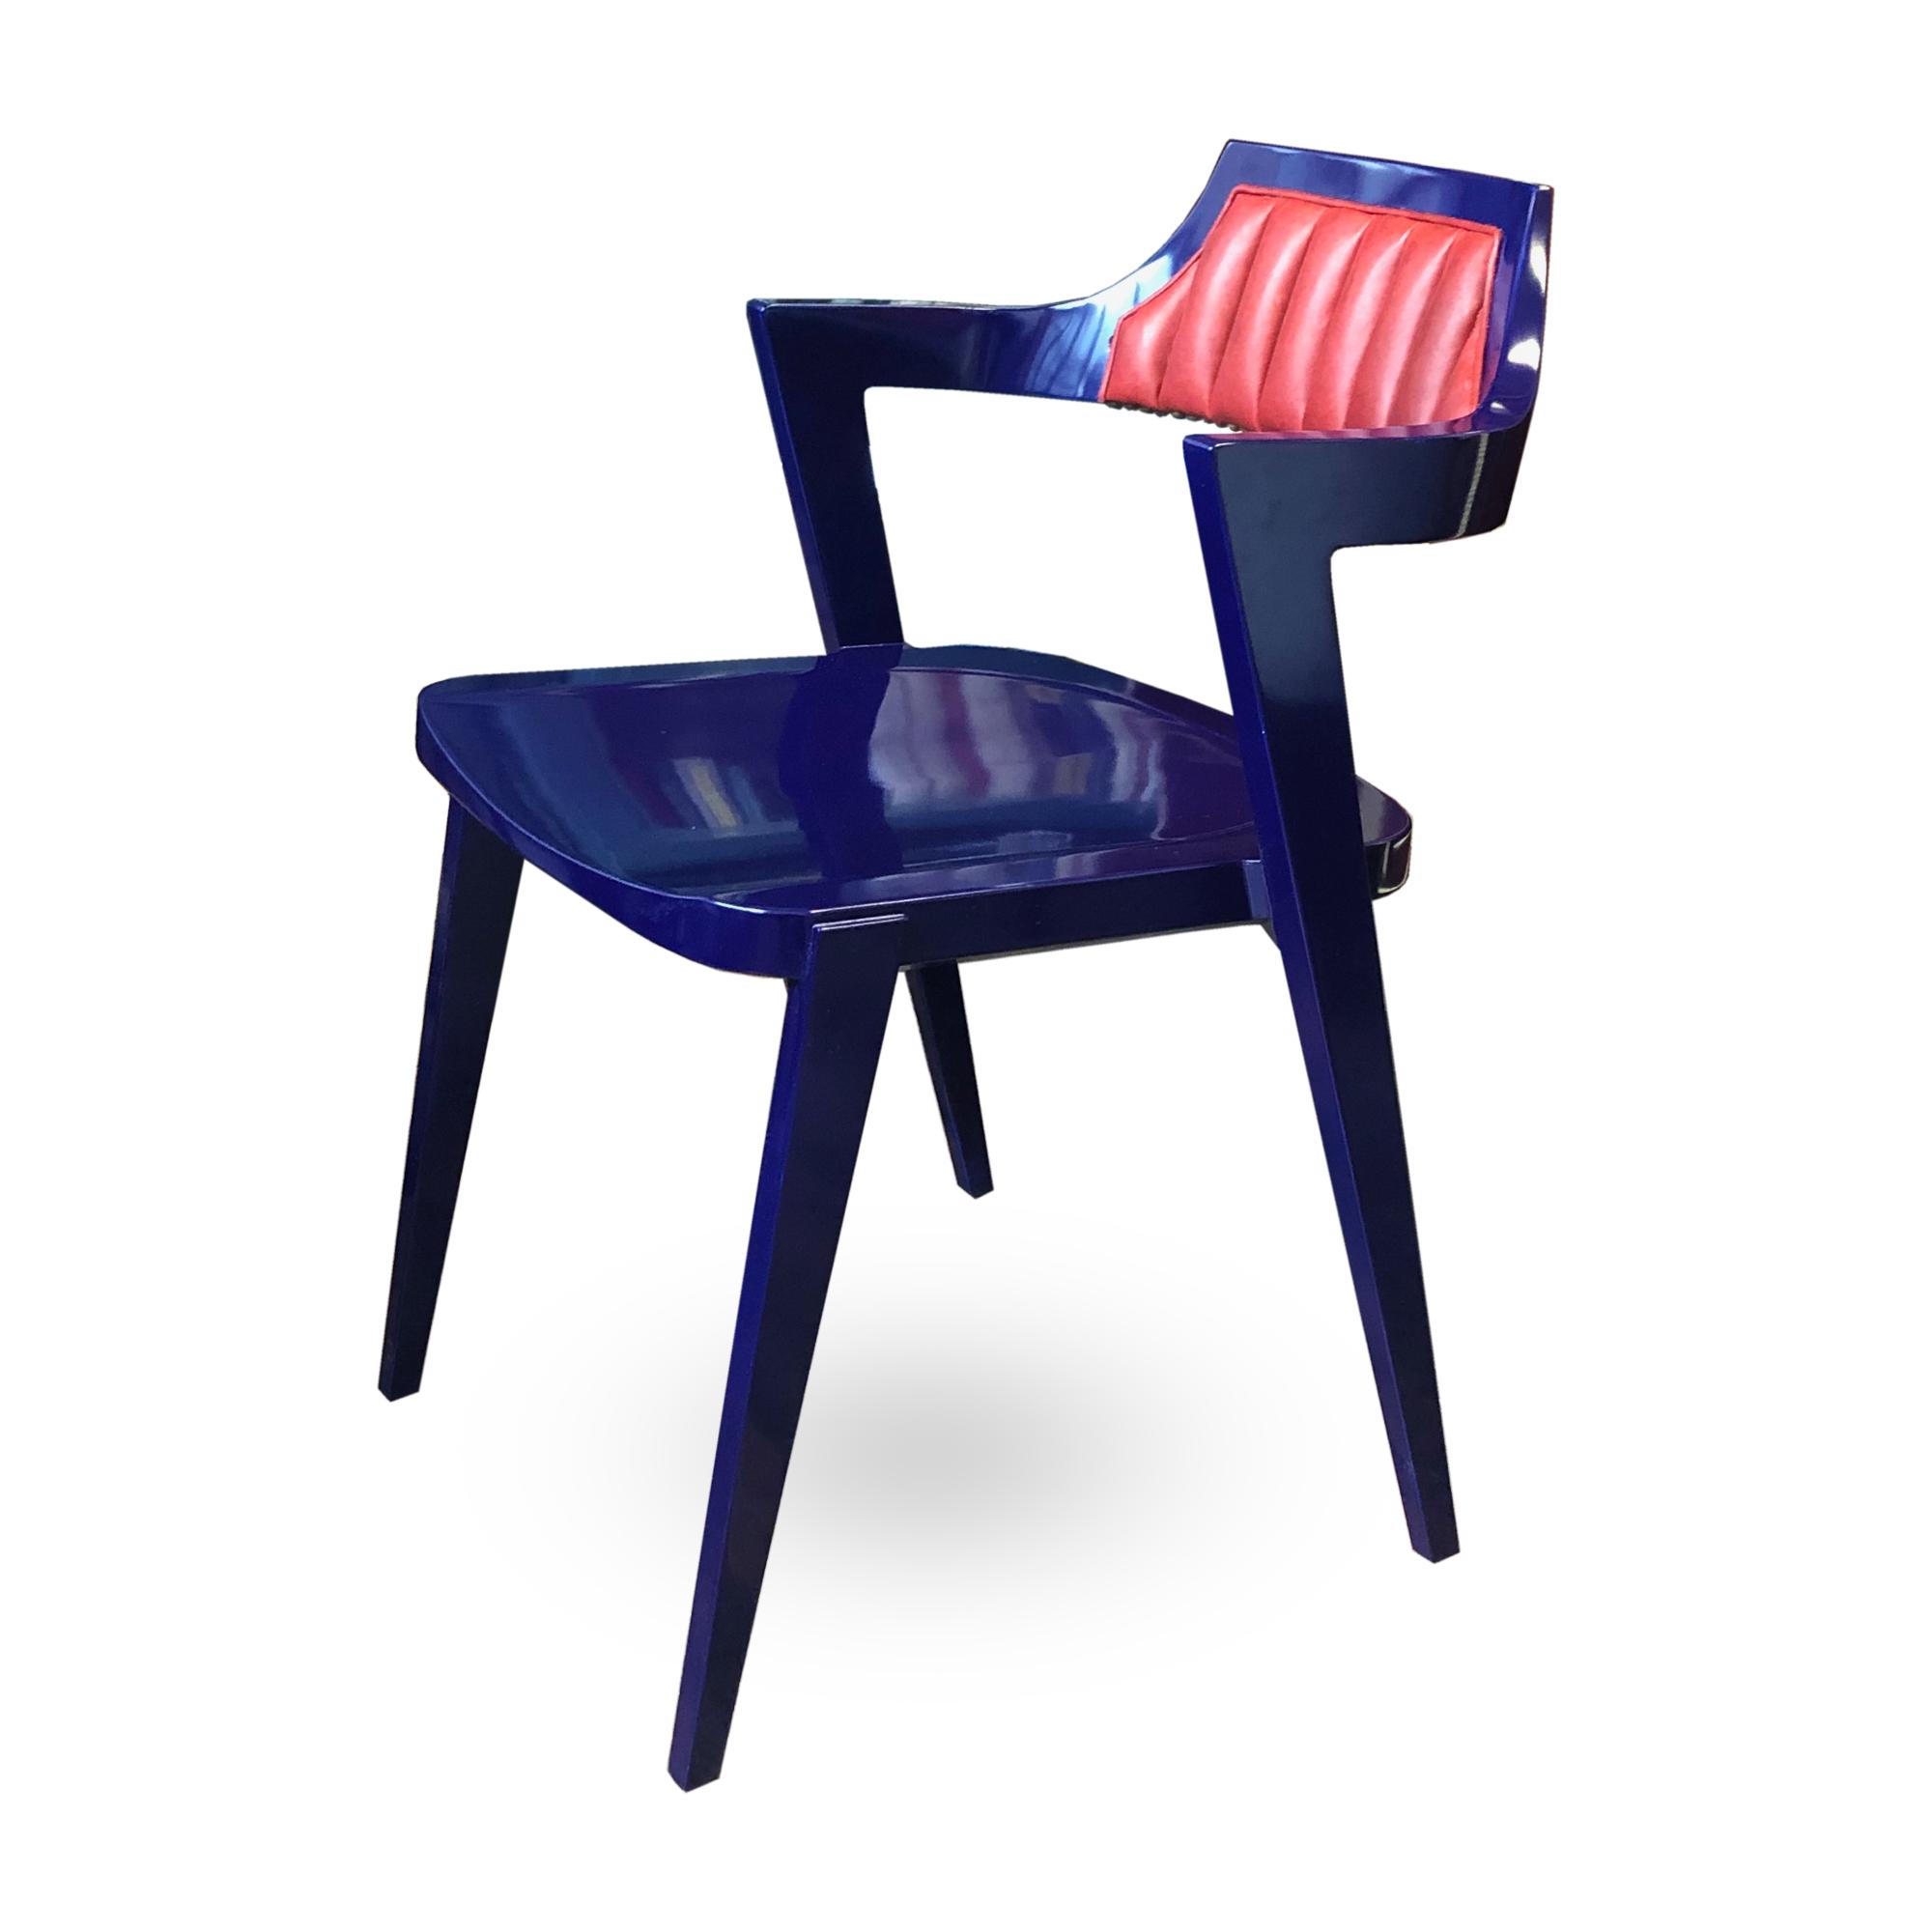 R813-ink-blue-stalking-chair-leather-upholstery-nailhead-trim-modern-design-Victoria&Son-custom.jpg